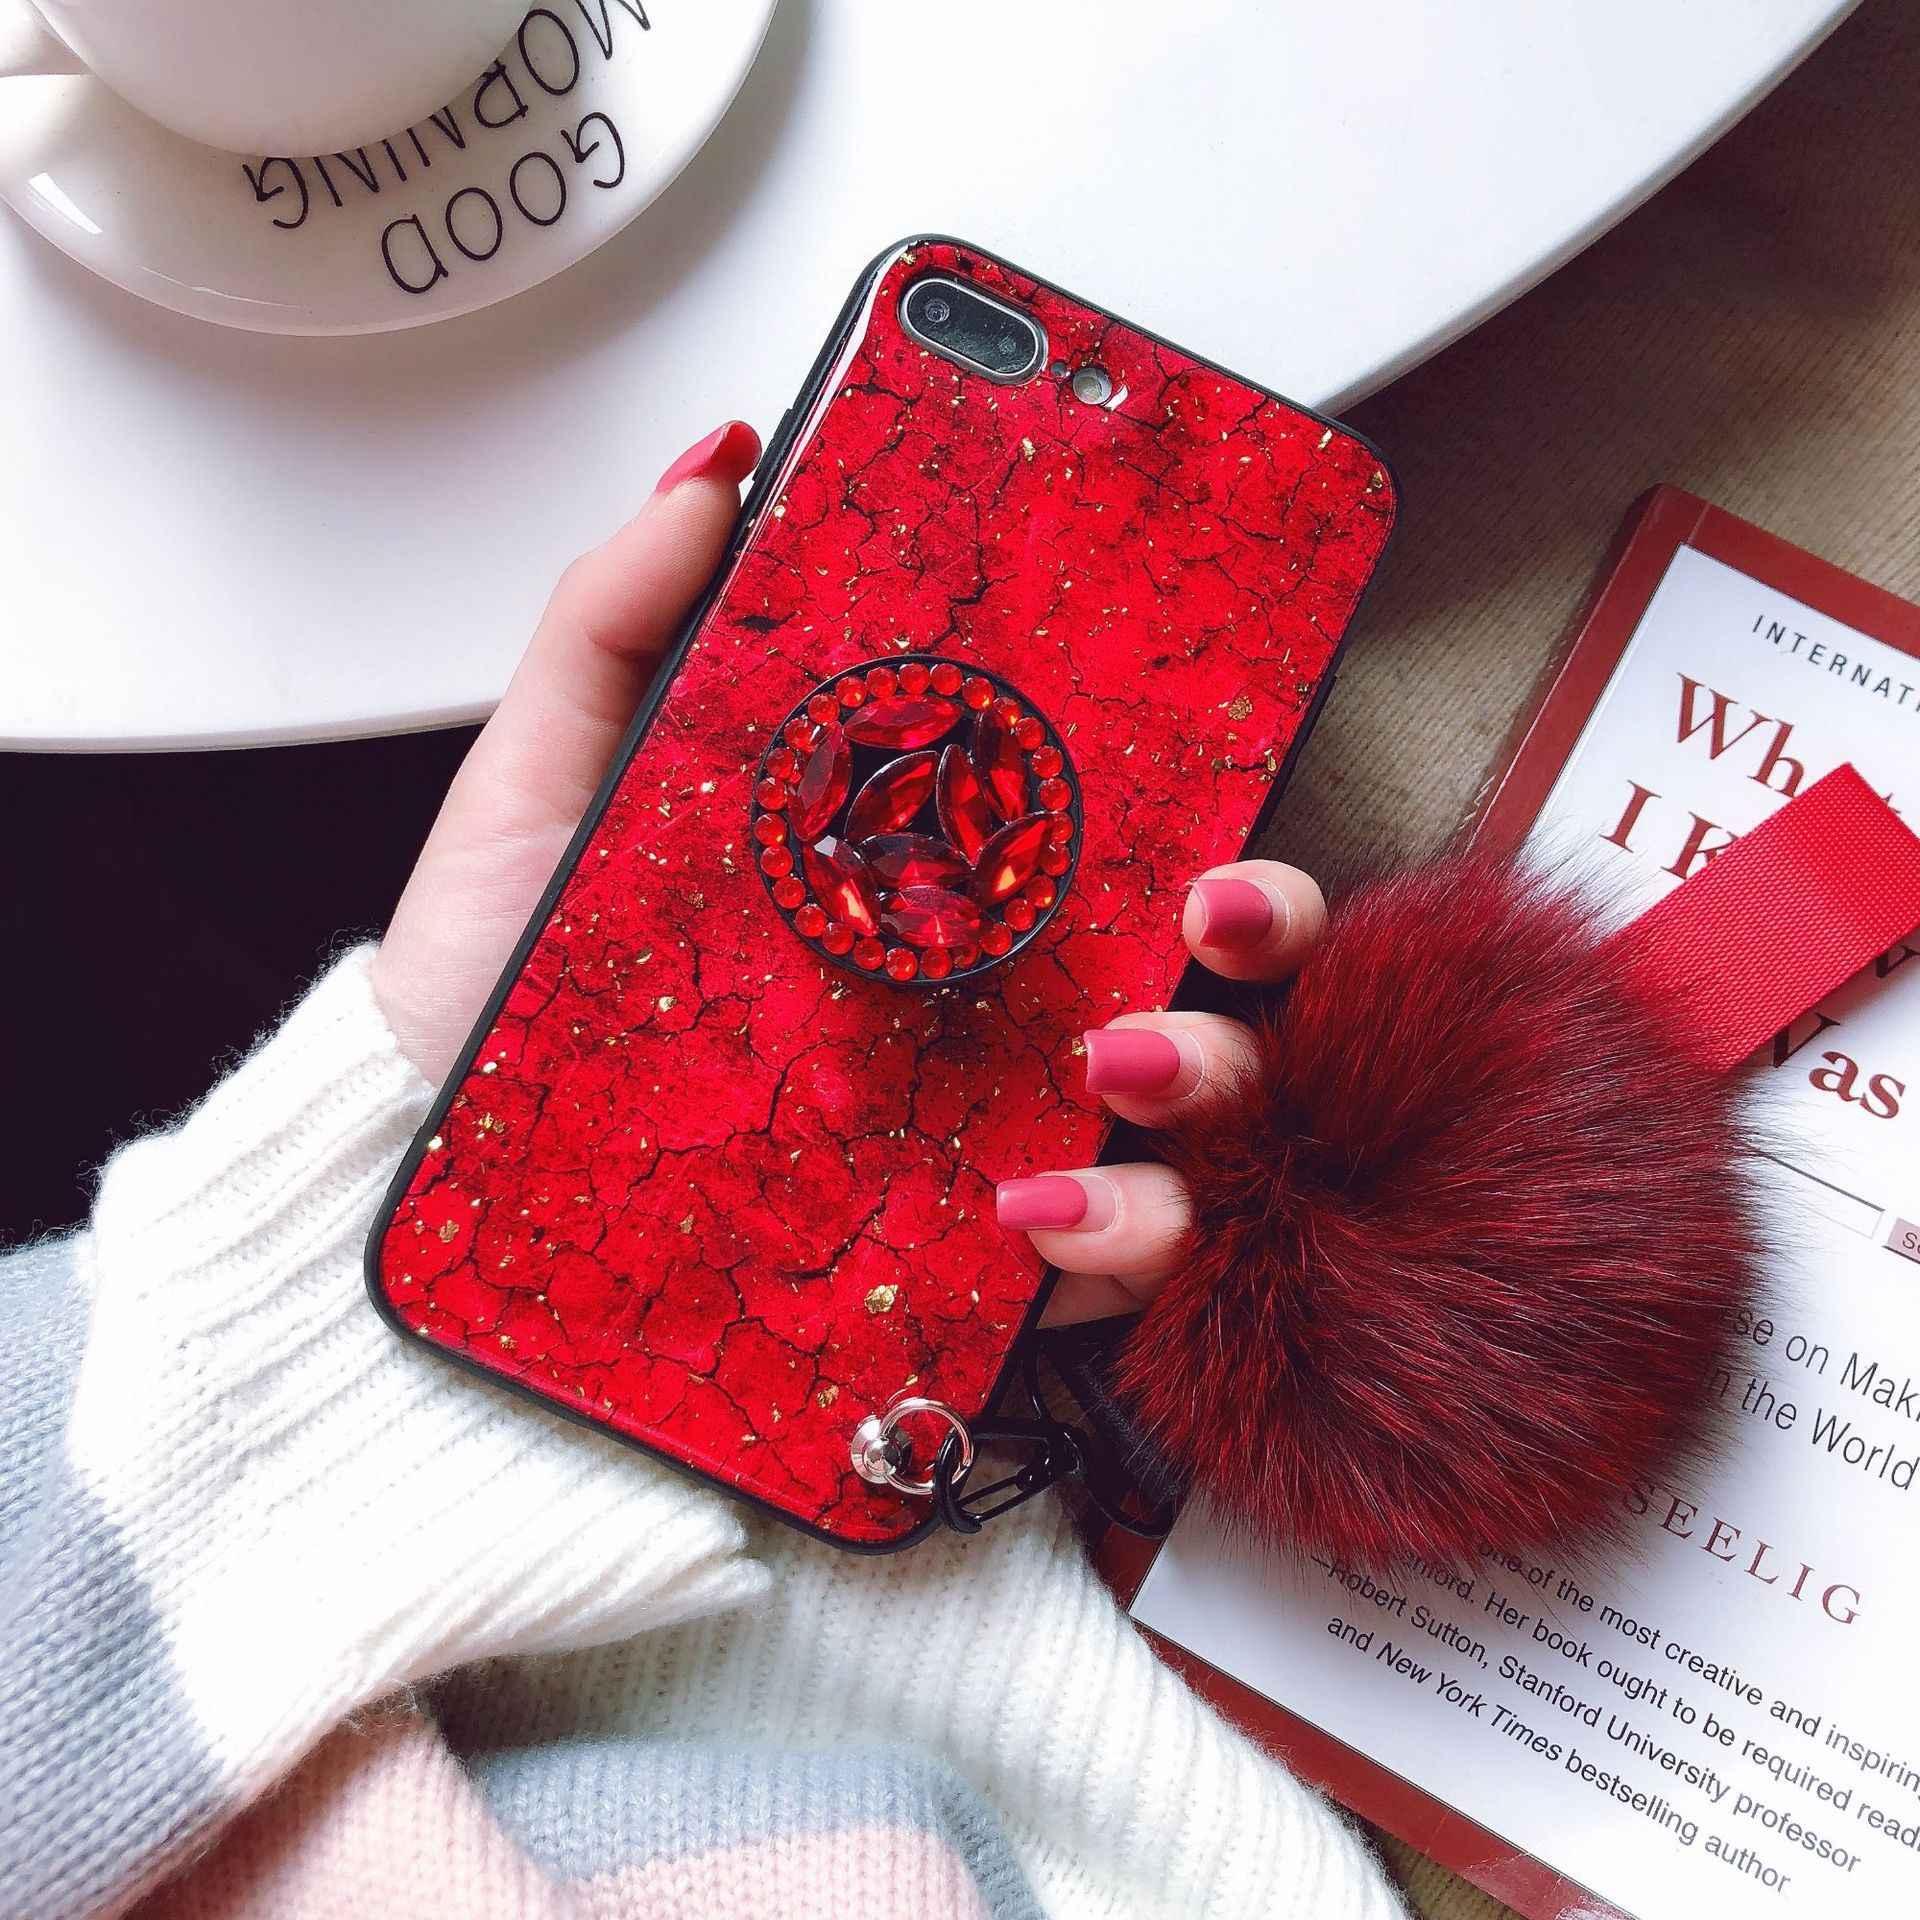 Мраморная 3D блестящая подставка с бриллиантами волосы мяч ремешок чехол для iphone XS XR 6 7 8 plus телефон чехол для redmi S2 xiaomi 8 9 9se